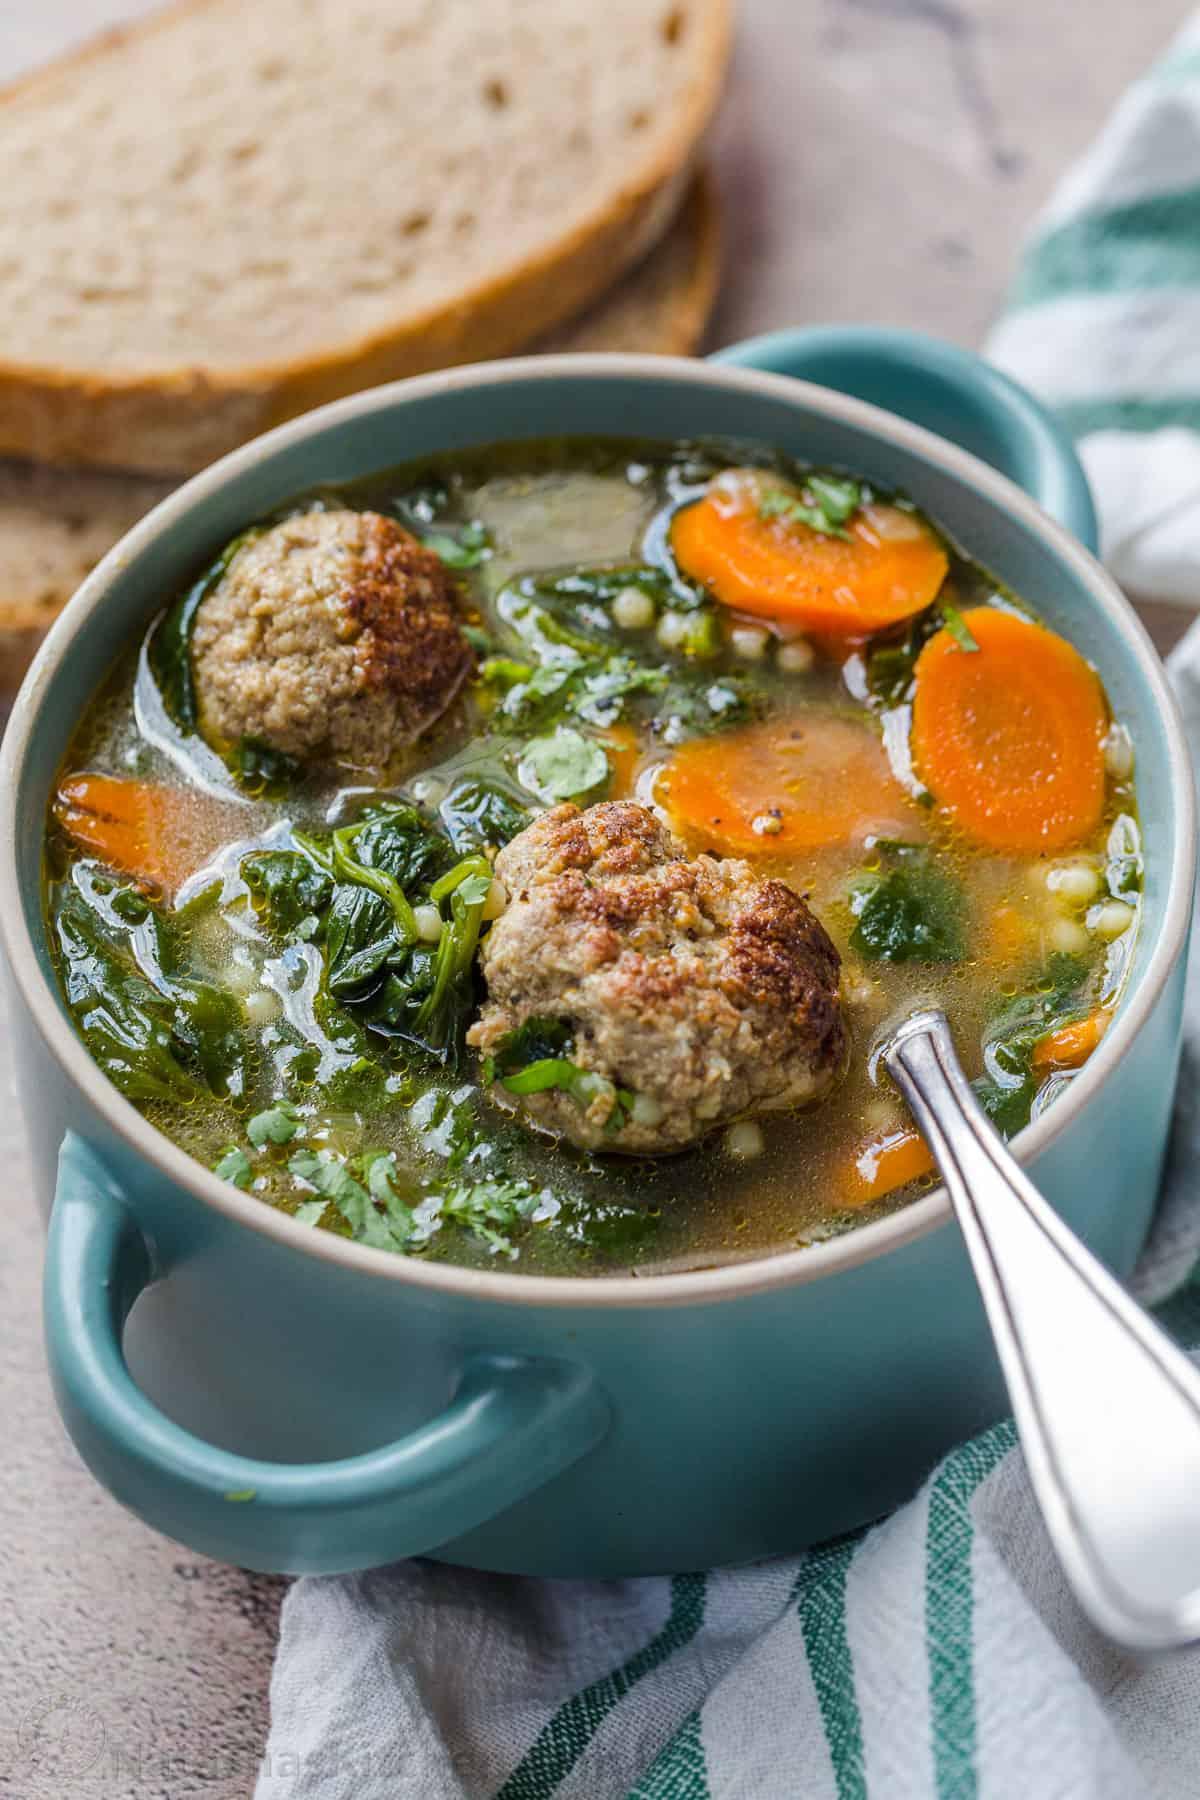 Italian Wedding Soup - Grandmas Simple Recipes